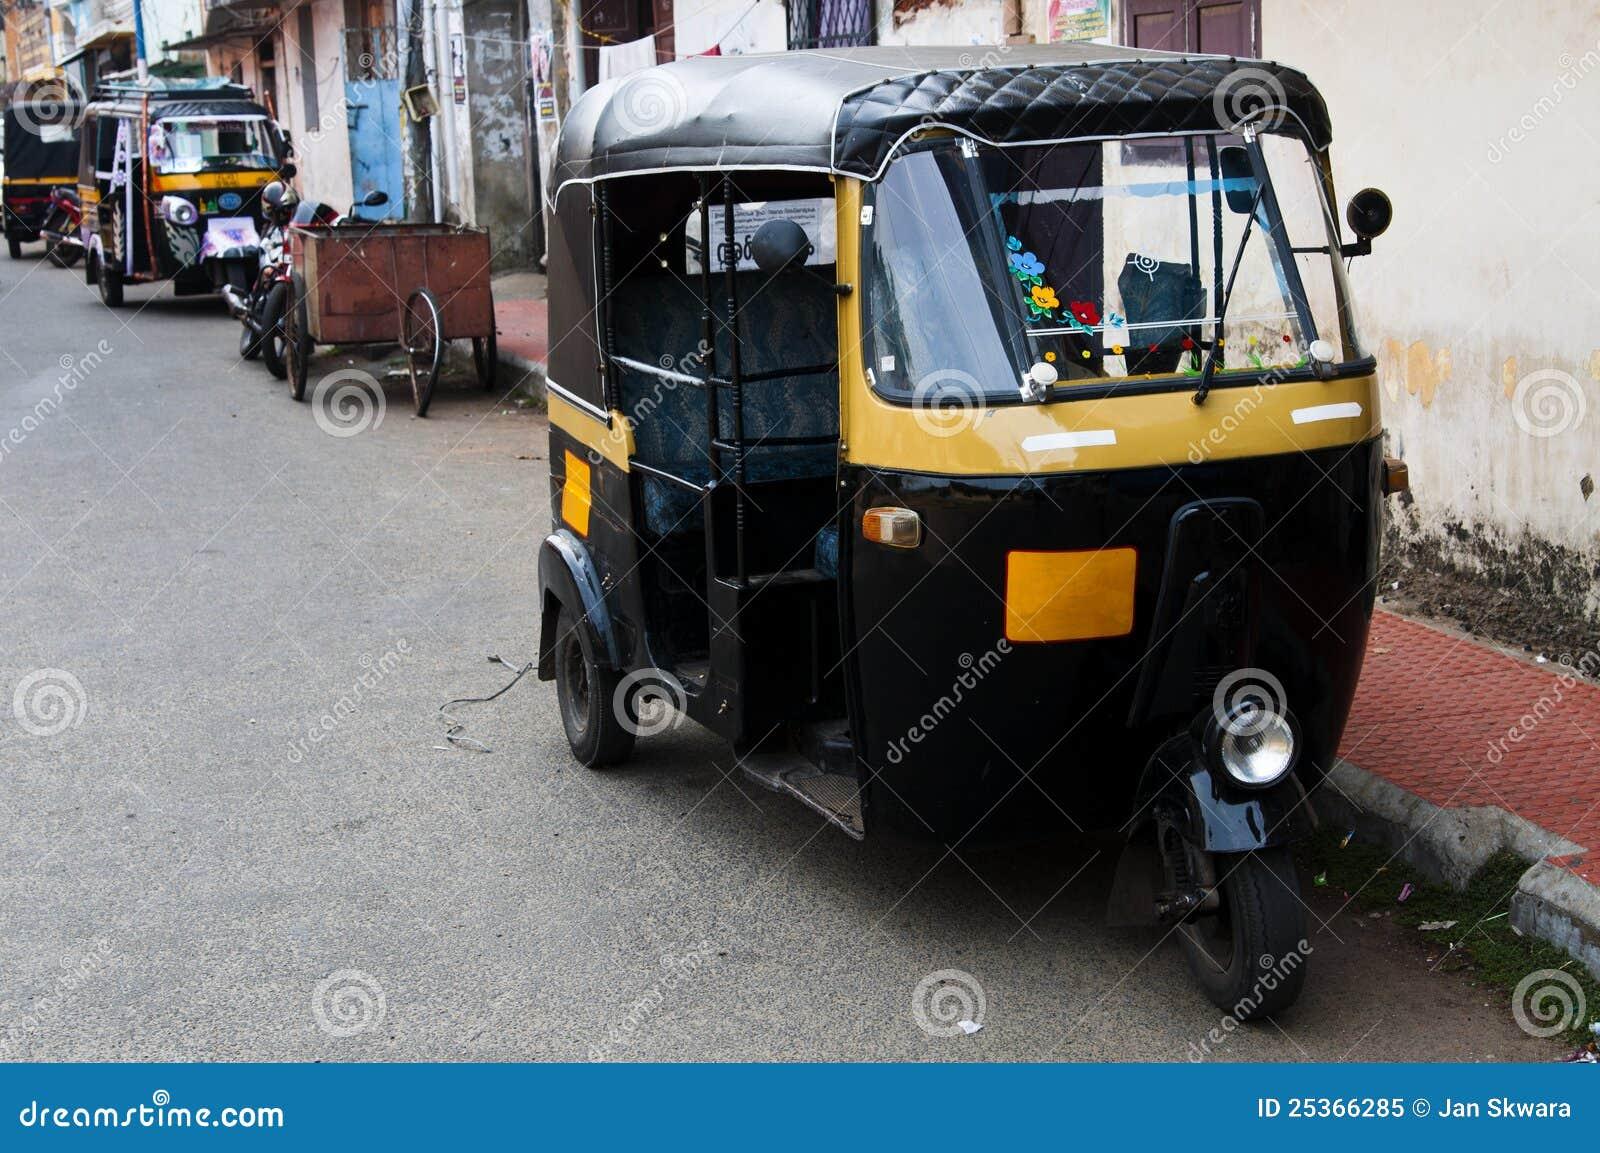 tut tuk auto rickshaw taxi in india royalty free stock. Black Bedroom Furniture Sets. Home Design Ideas